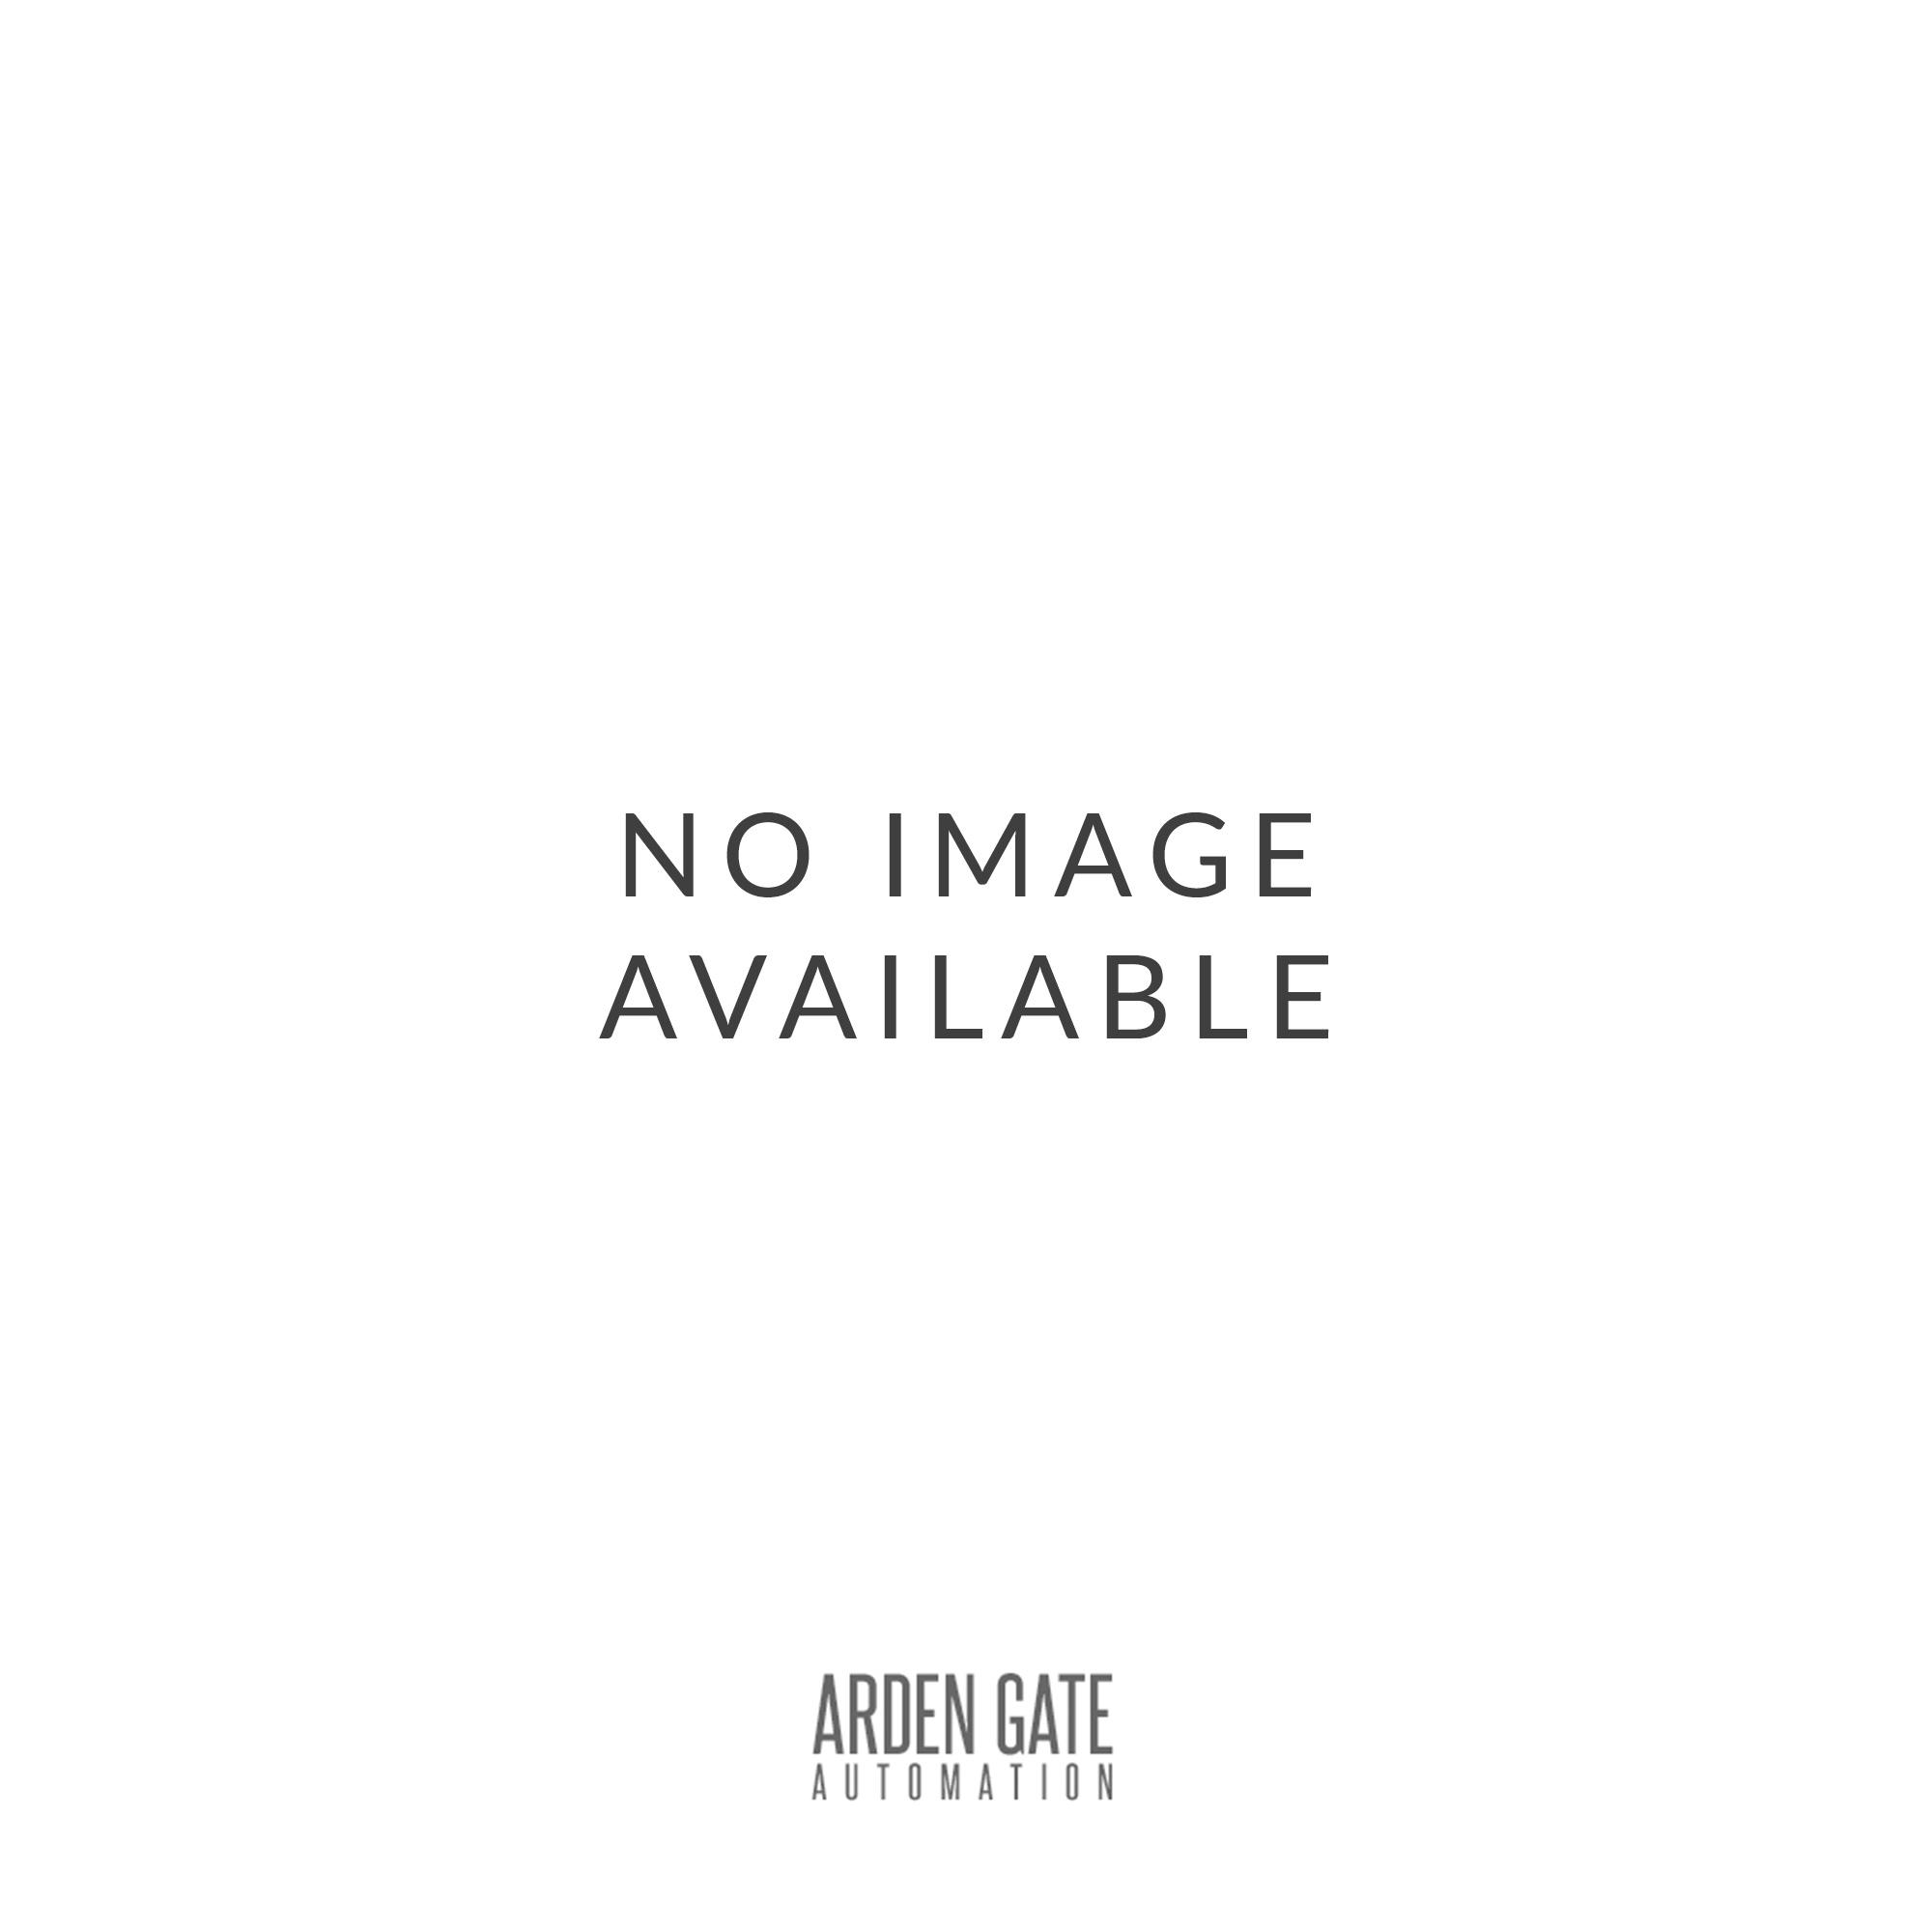 SIGNET LOCKS SBL1601 Bolt on latch for 10mm to 30mm gate frames